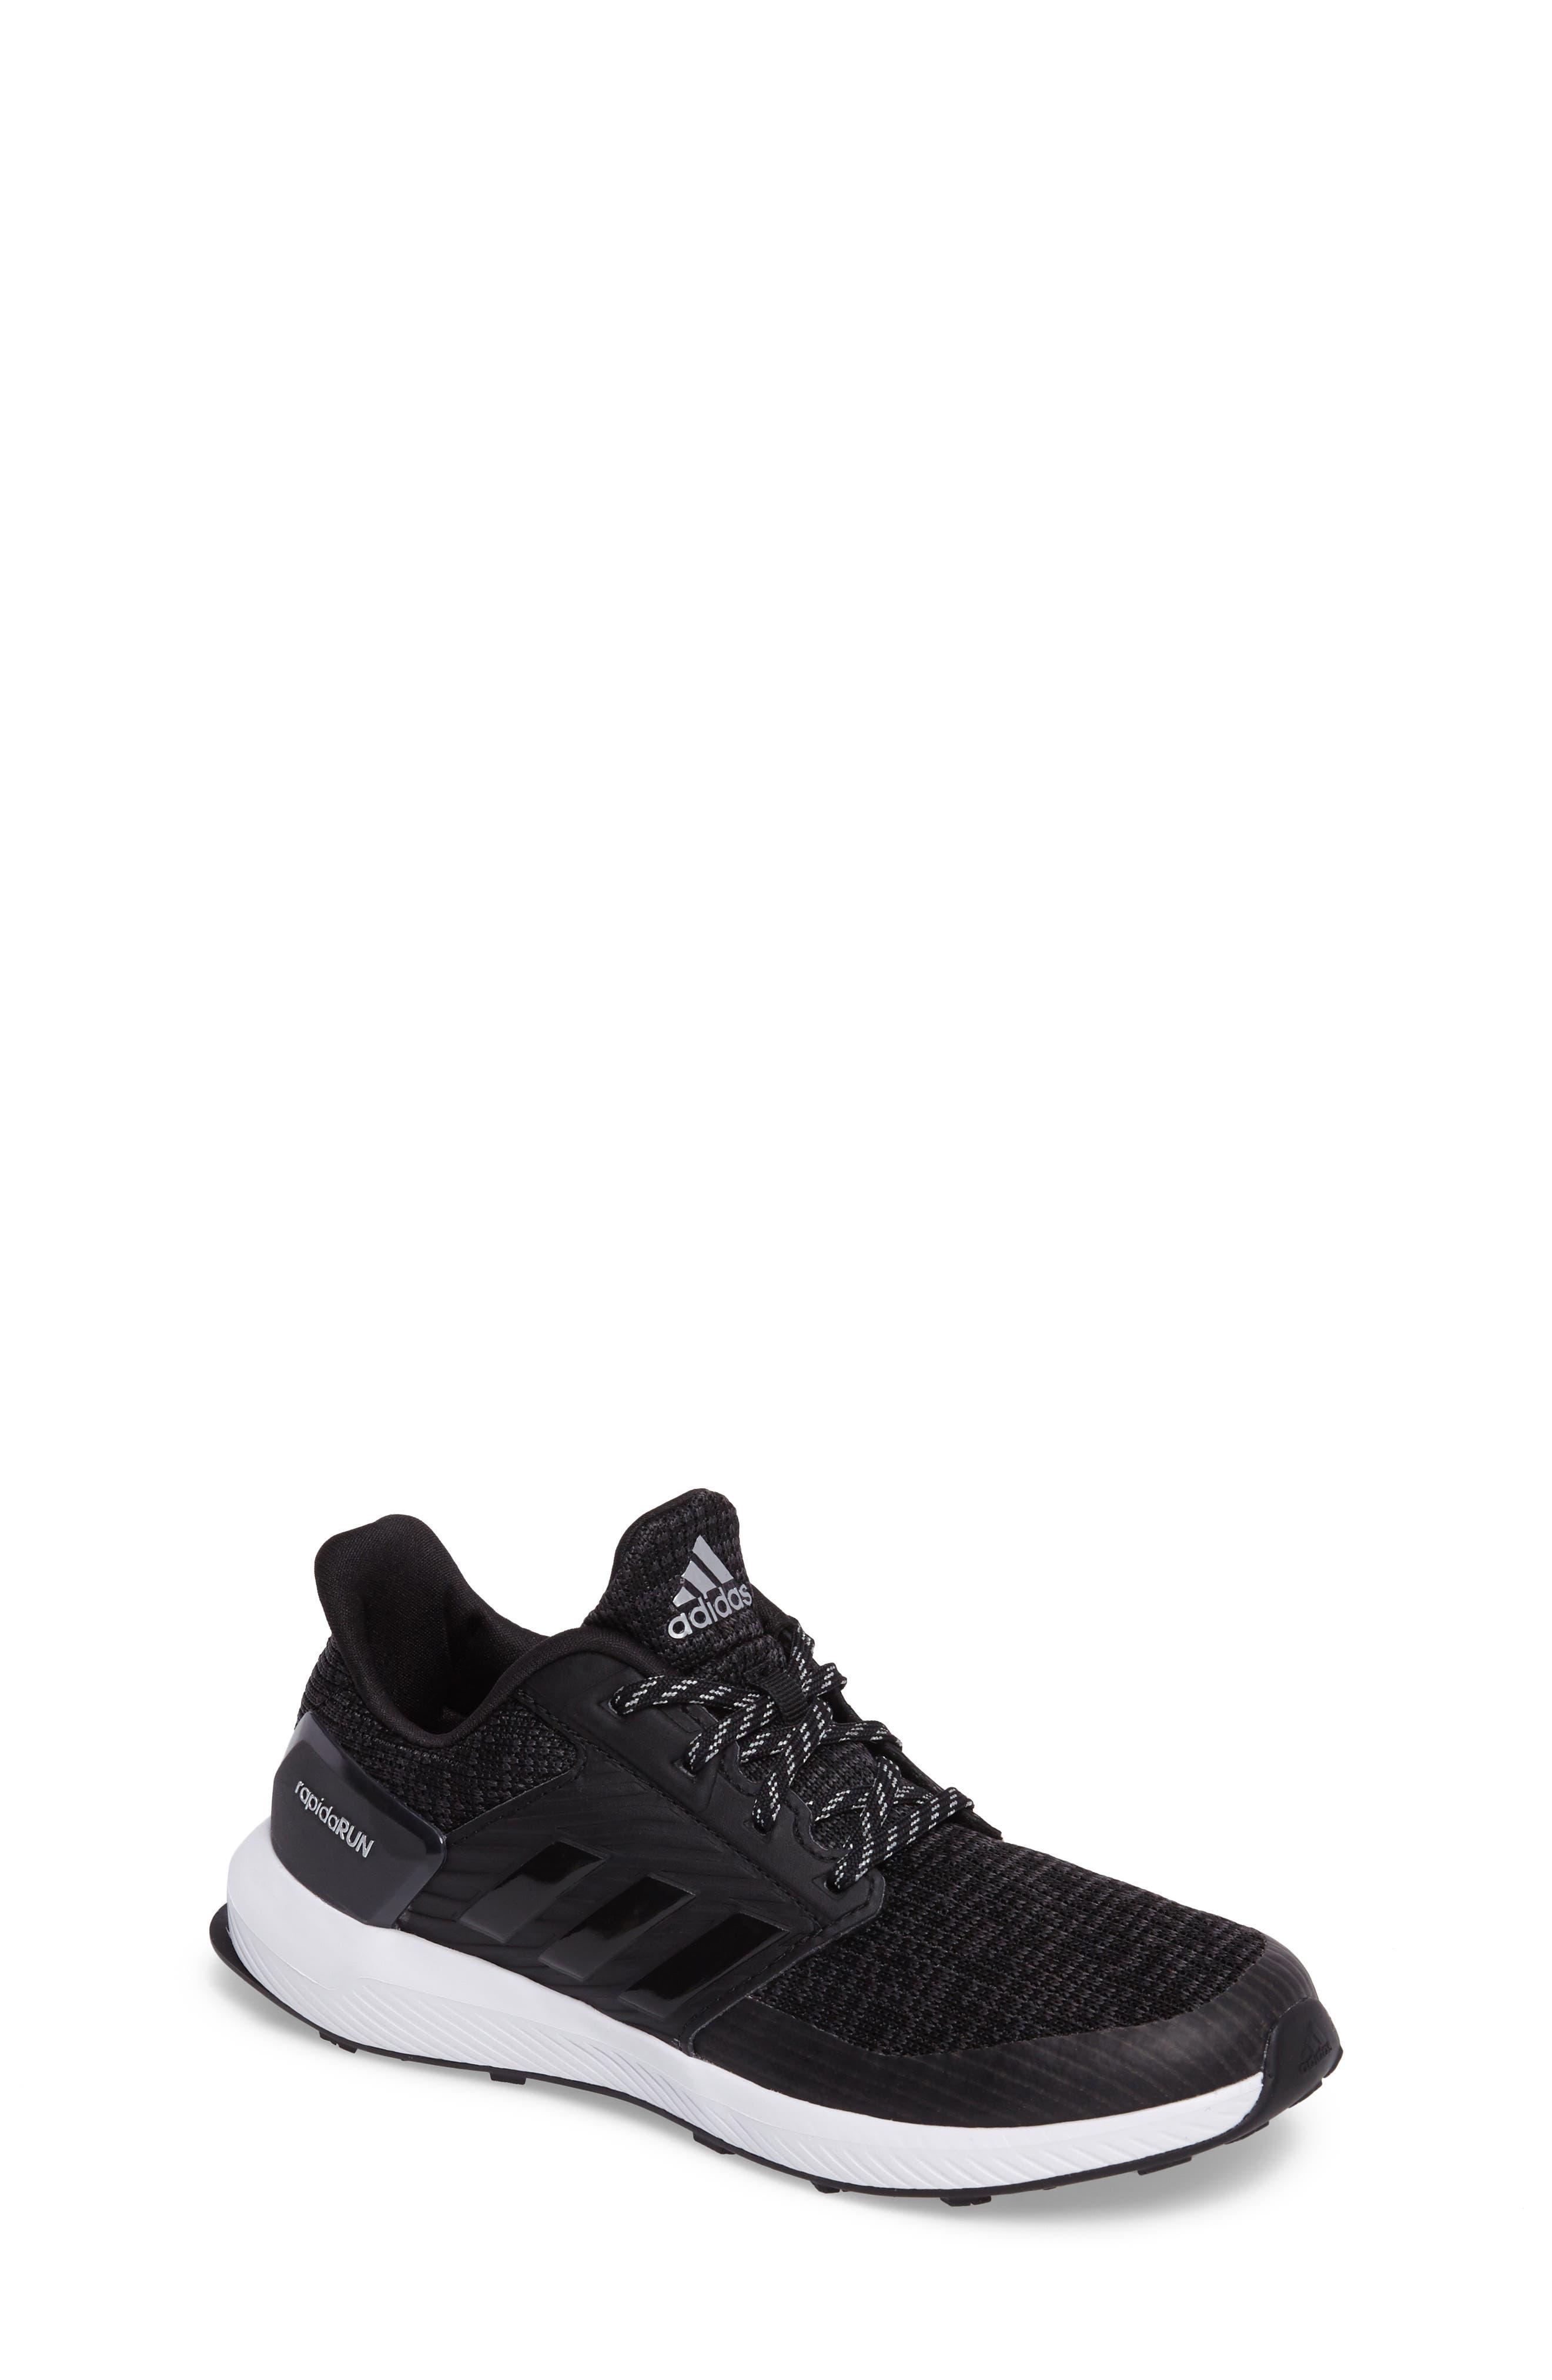 Main Image - adidas RapidaRUN Lux Sneaker (Toddler & Little Kid)